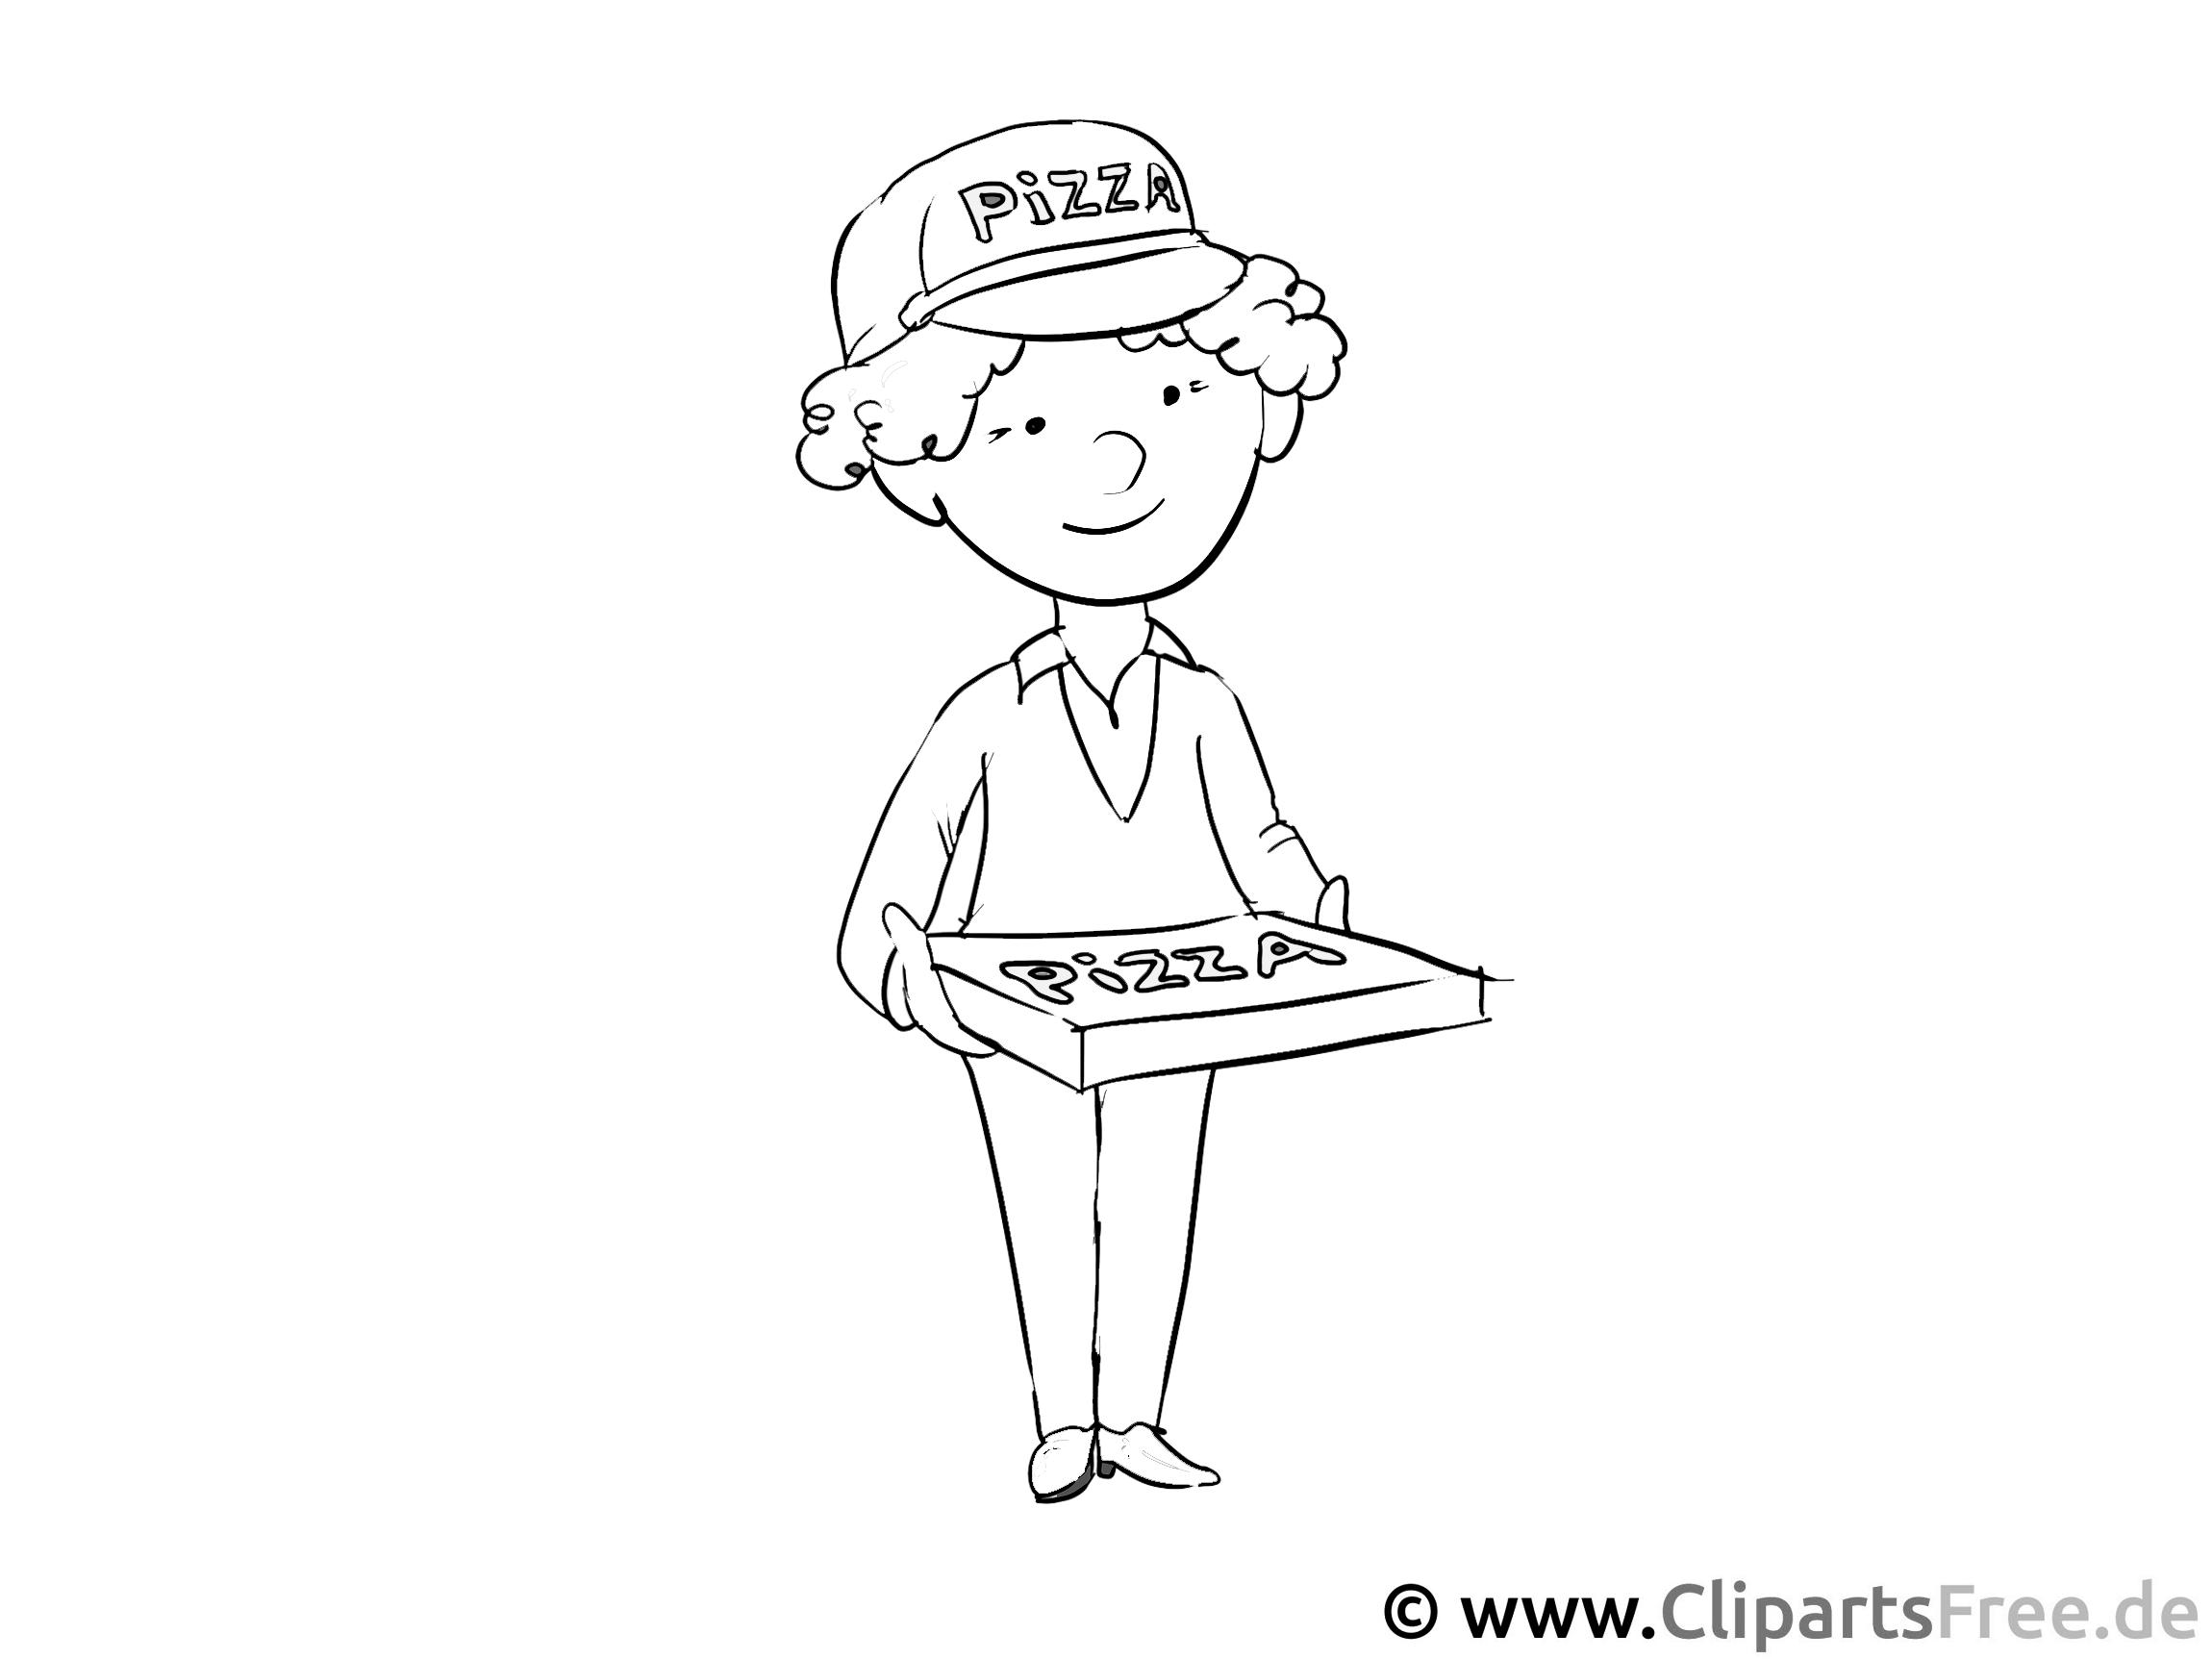 Pizzaträger - Malvorlagen Berufe